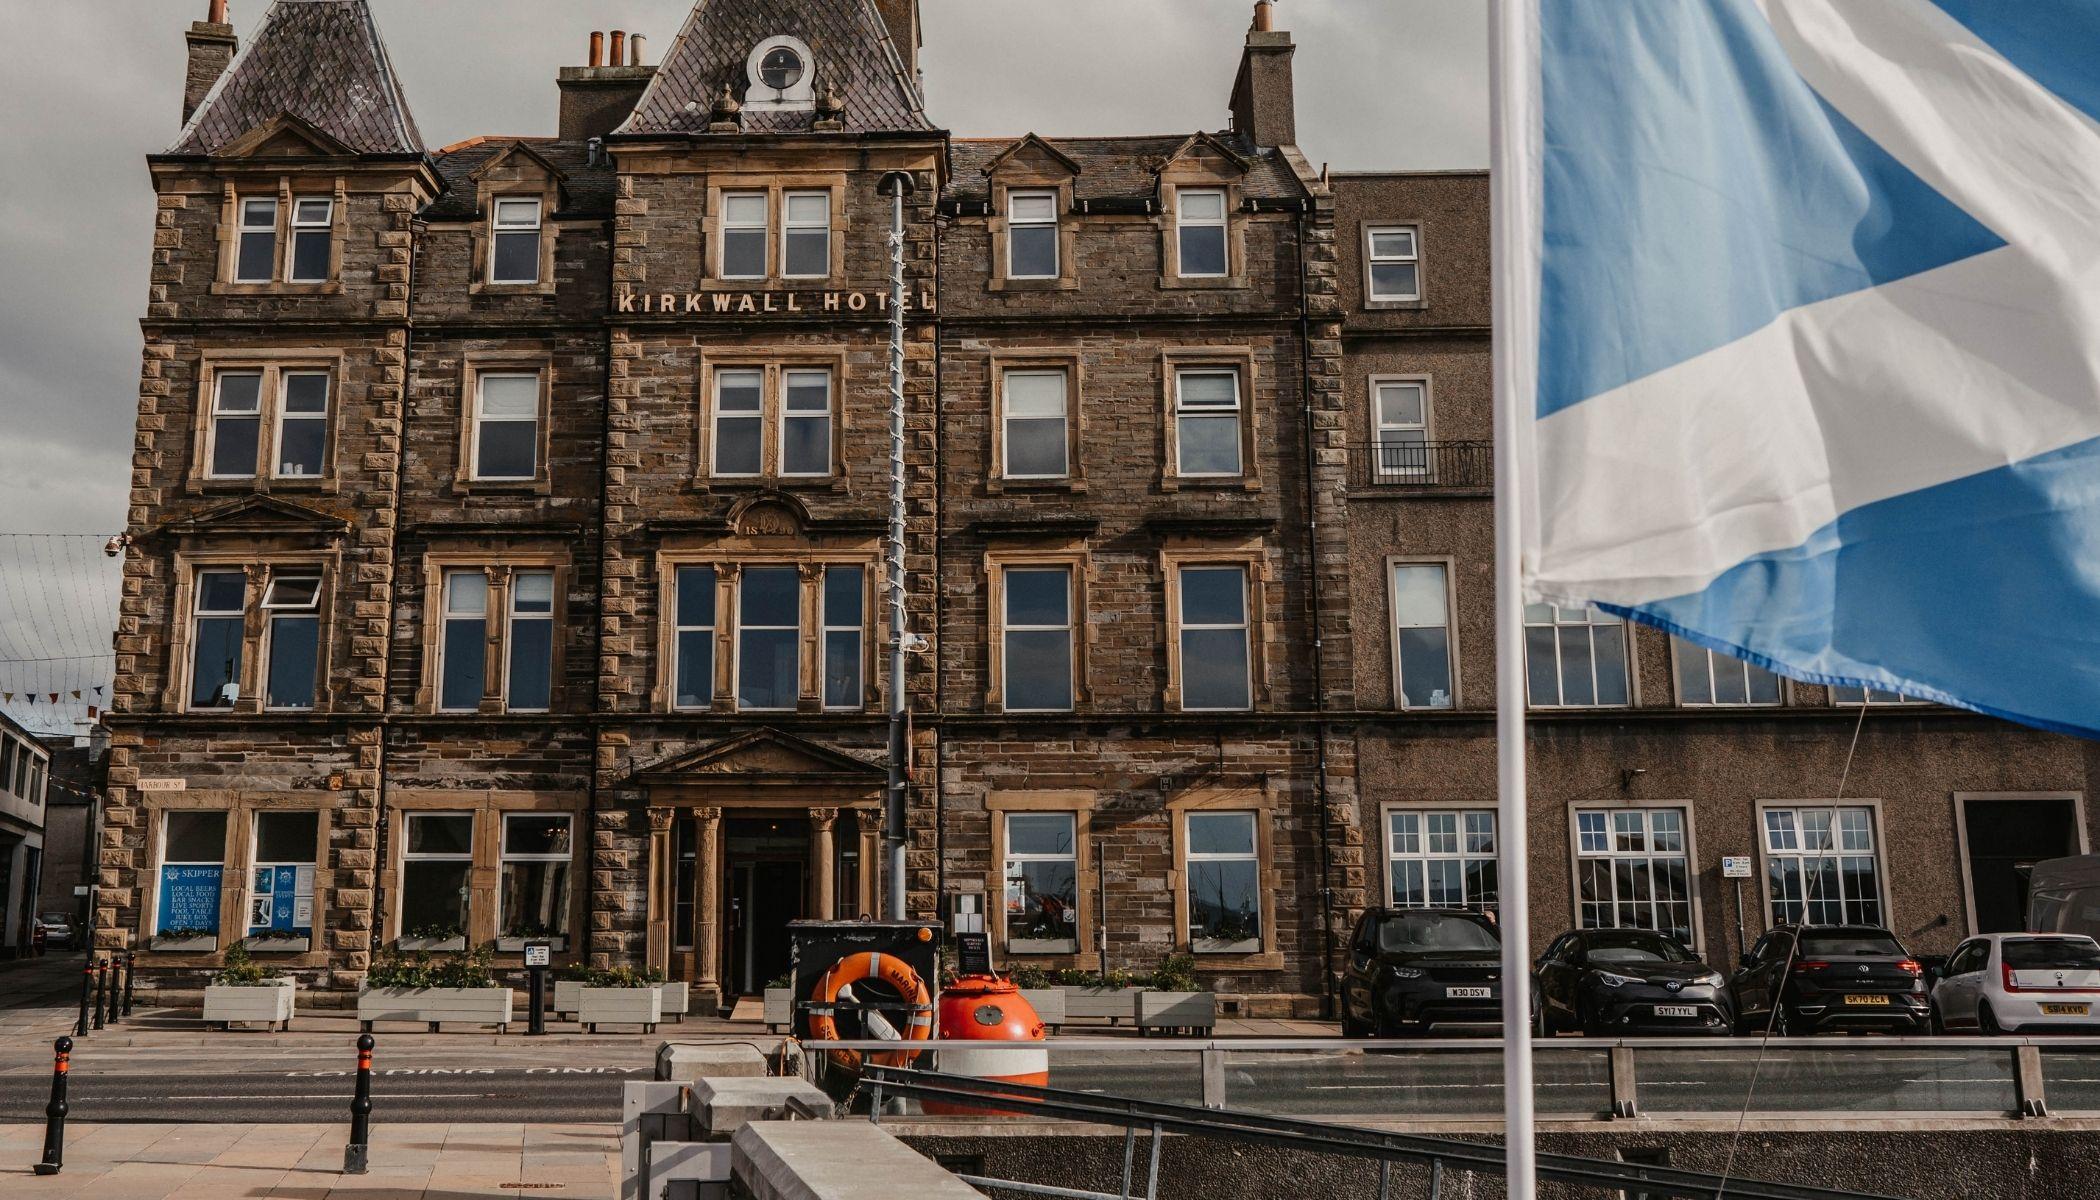 The Kirkwall Hotel